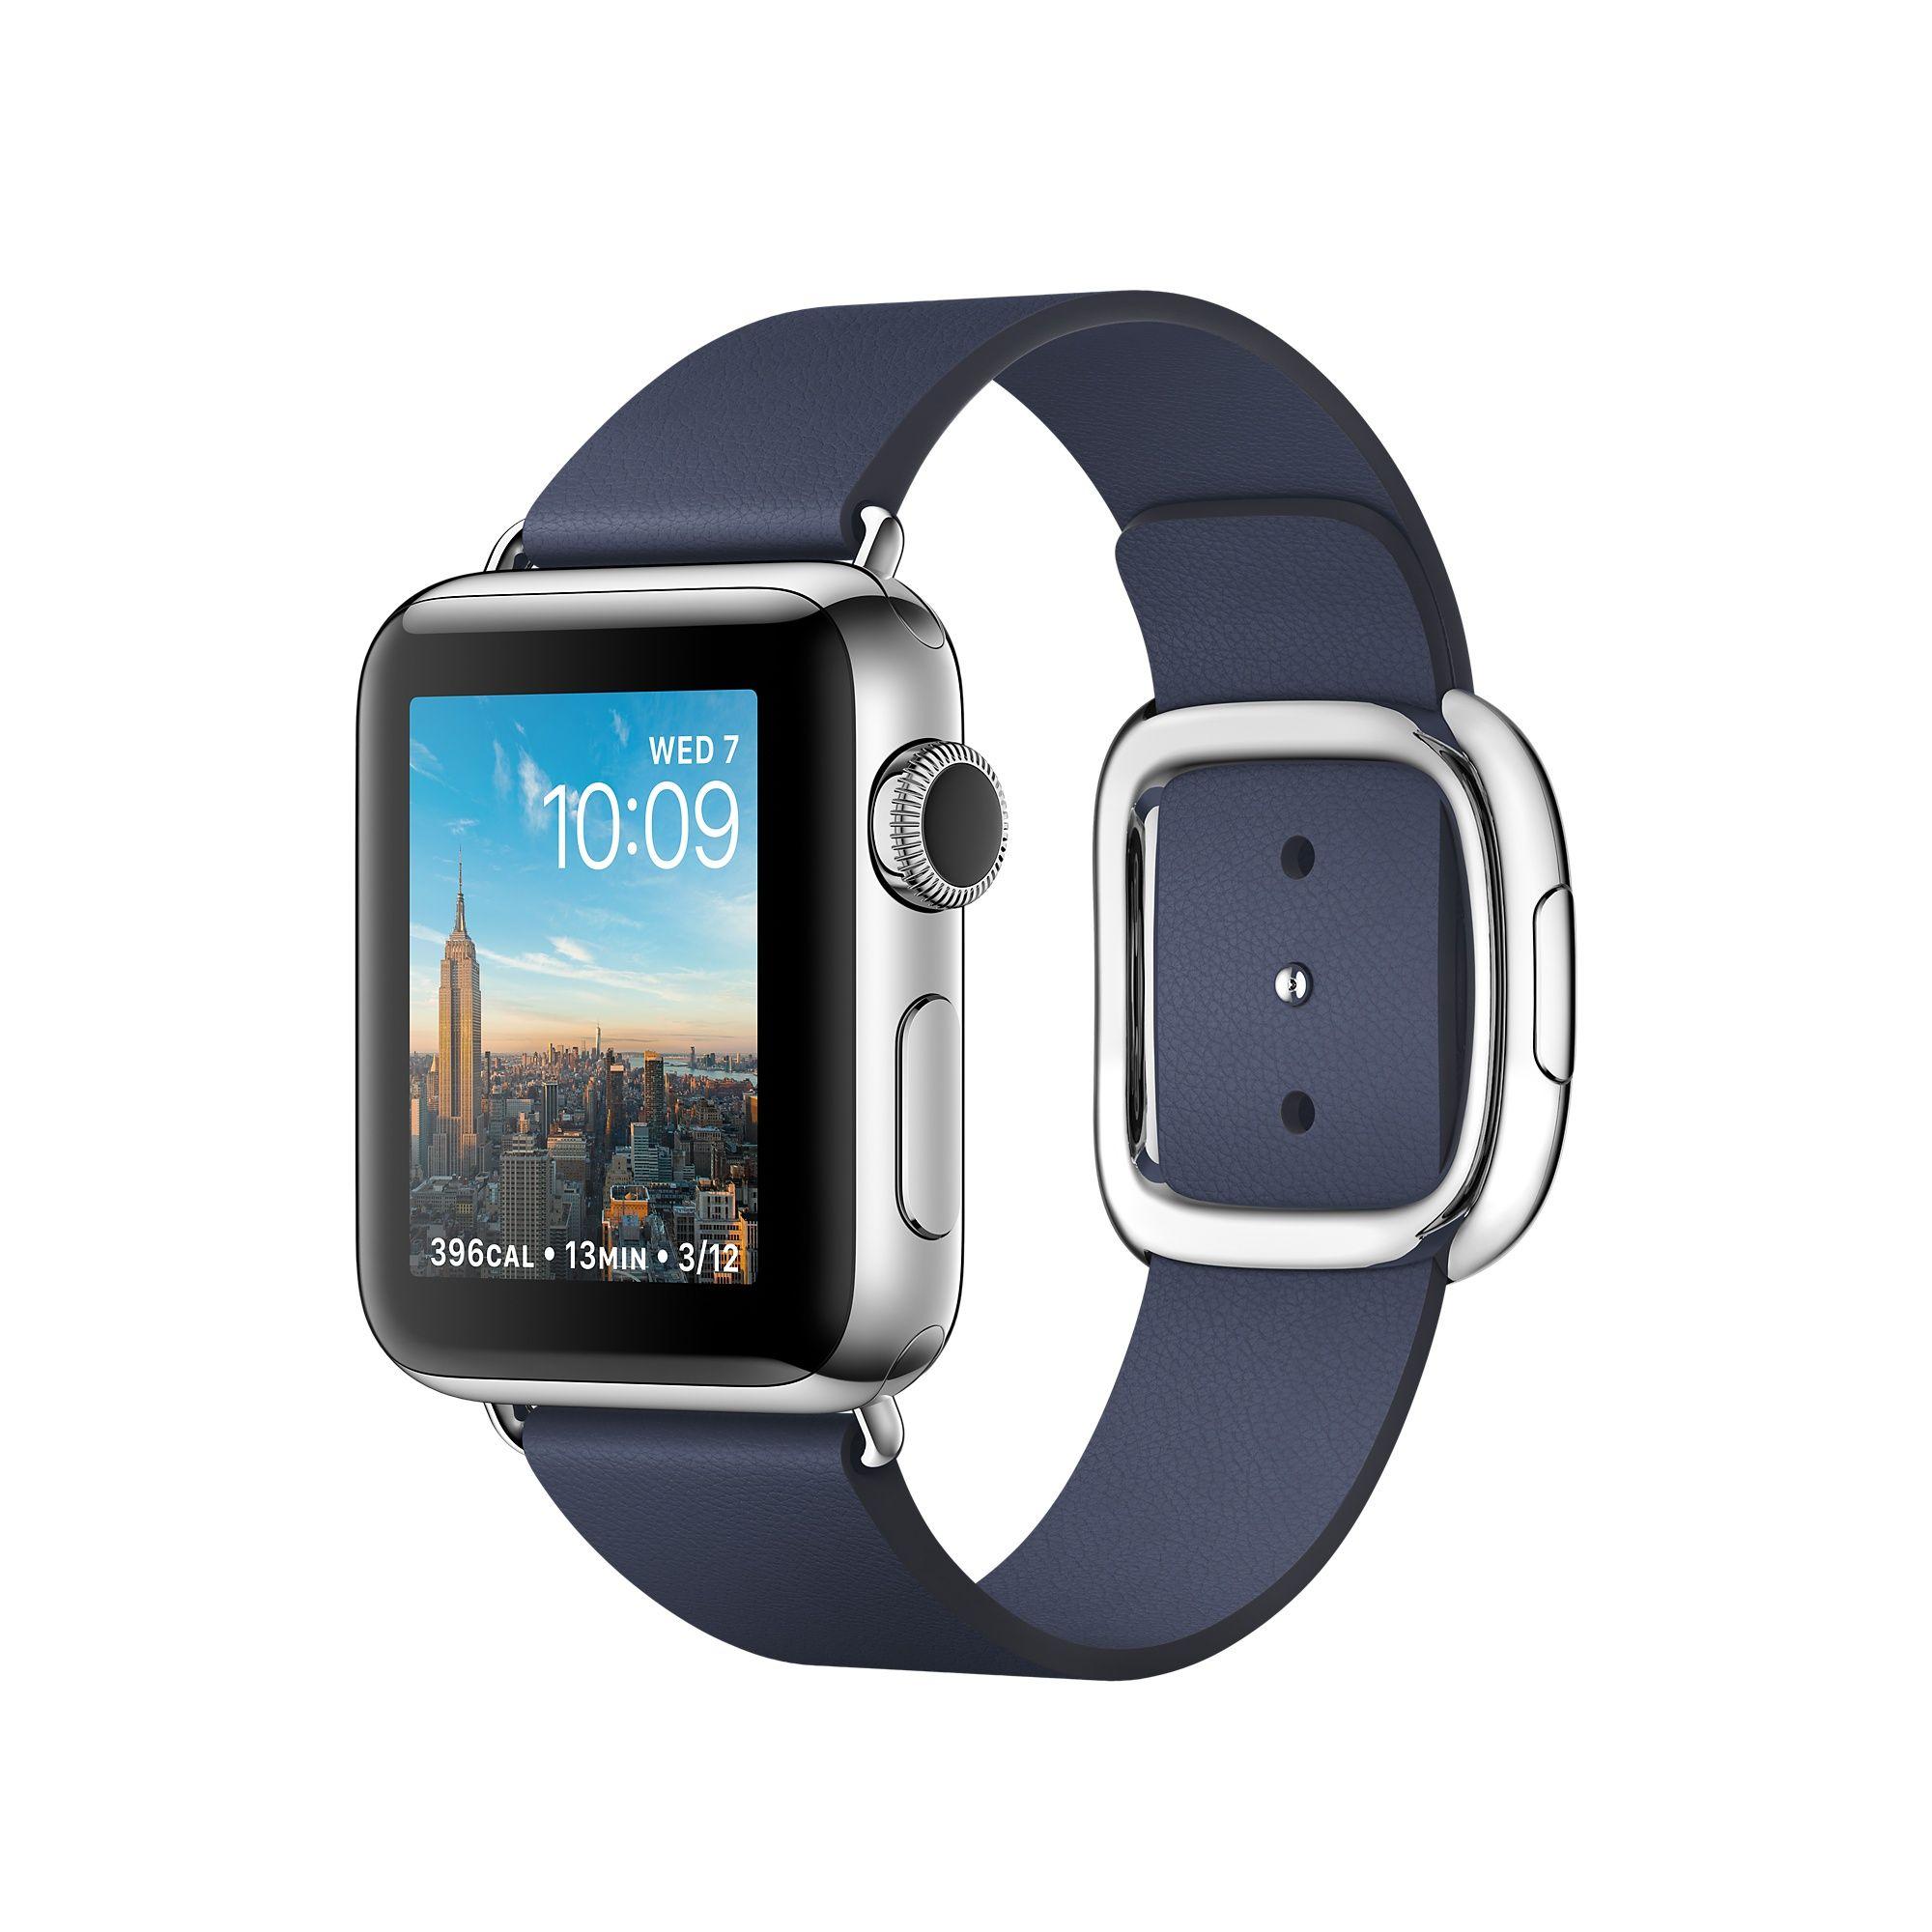 Buy Apple Watch Series 5 Buy Apple Watch Apple Watch New Apple Watch